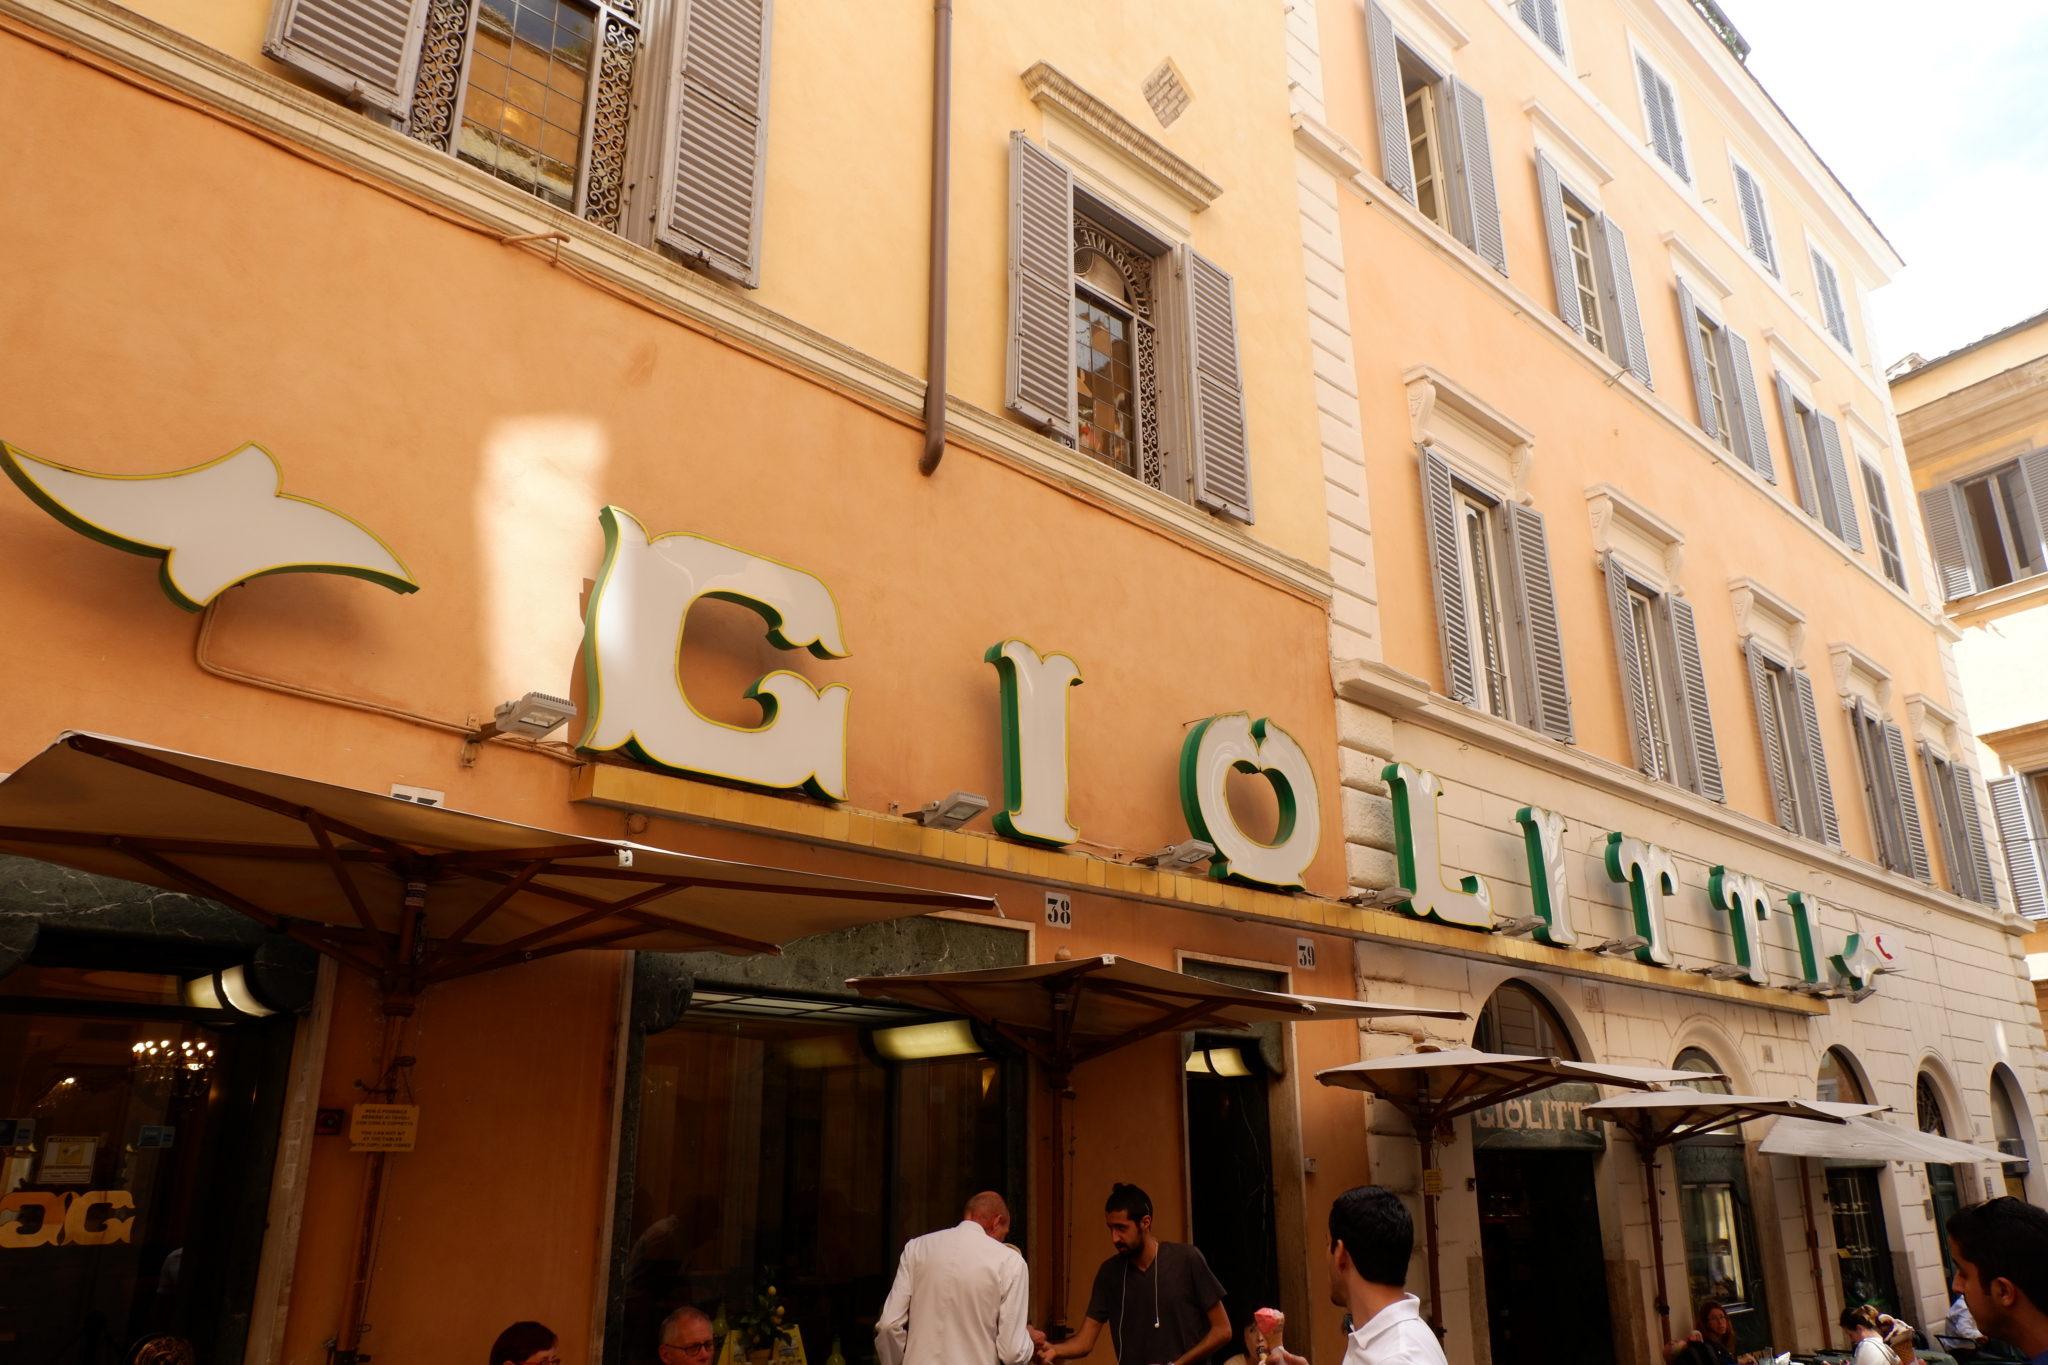 Giolitti - Cafe and Gelato